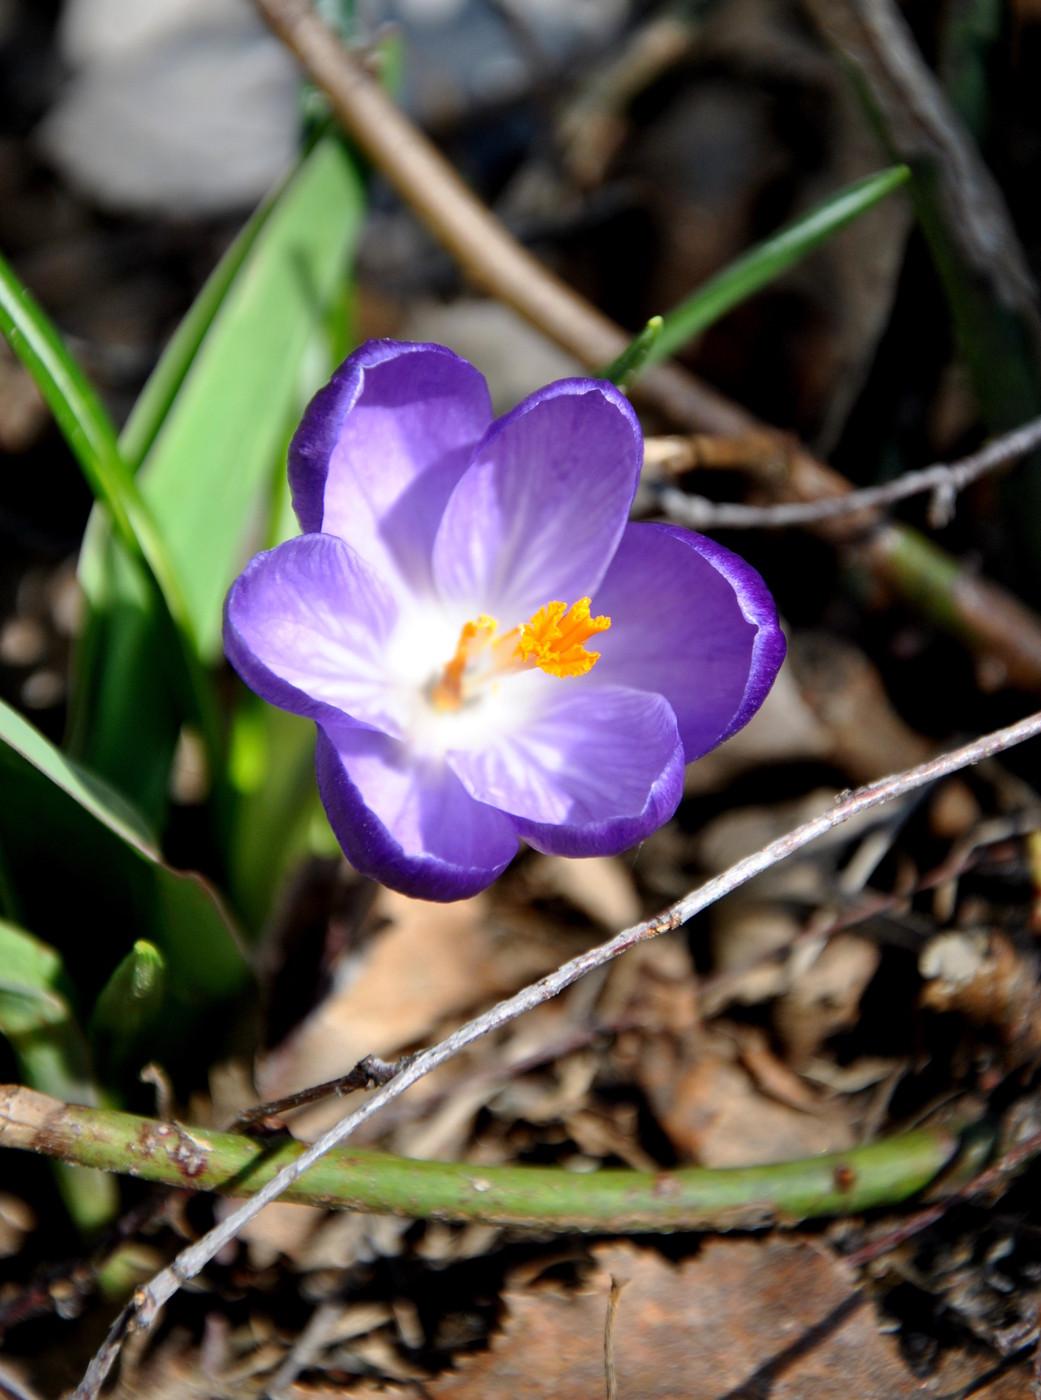 Askel kevääseen